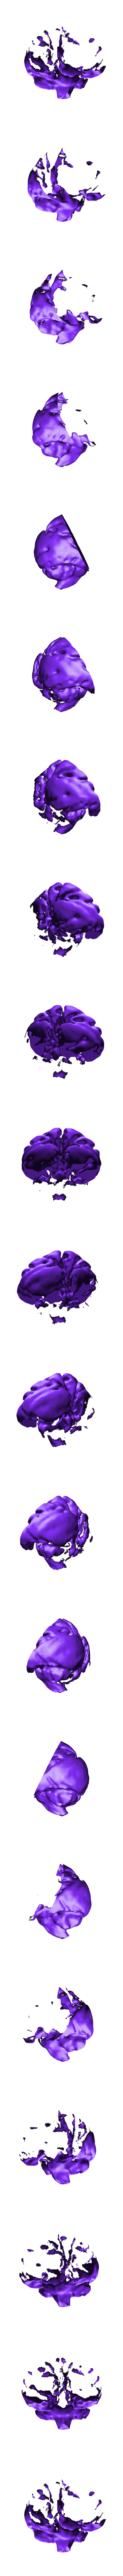 postsimp.stl Download free STL file Ape Skull • 3D printable template, LordLilapause